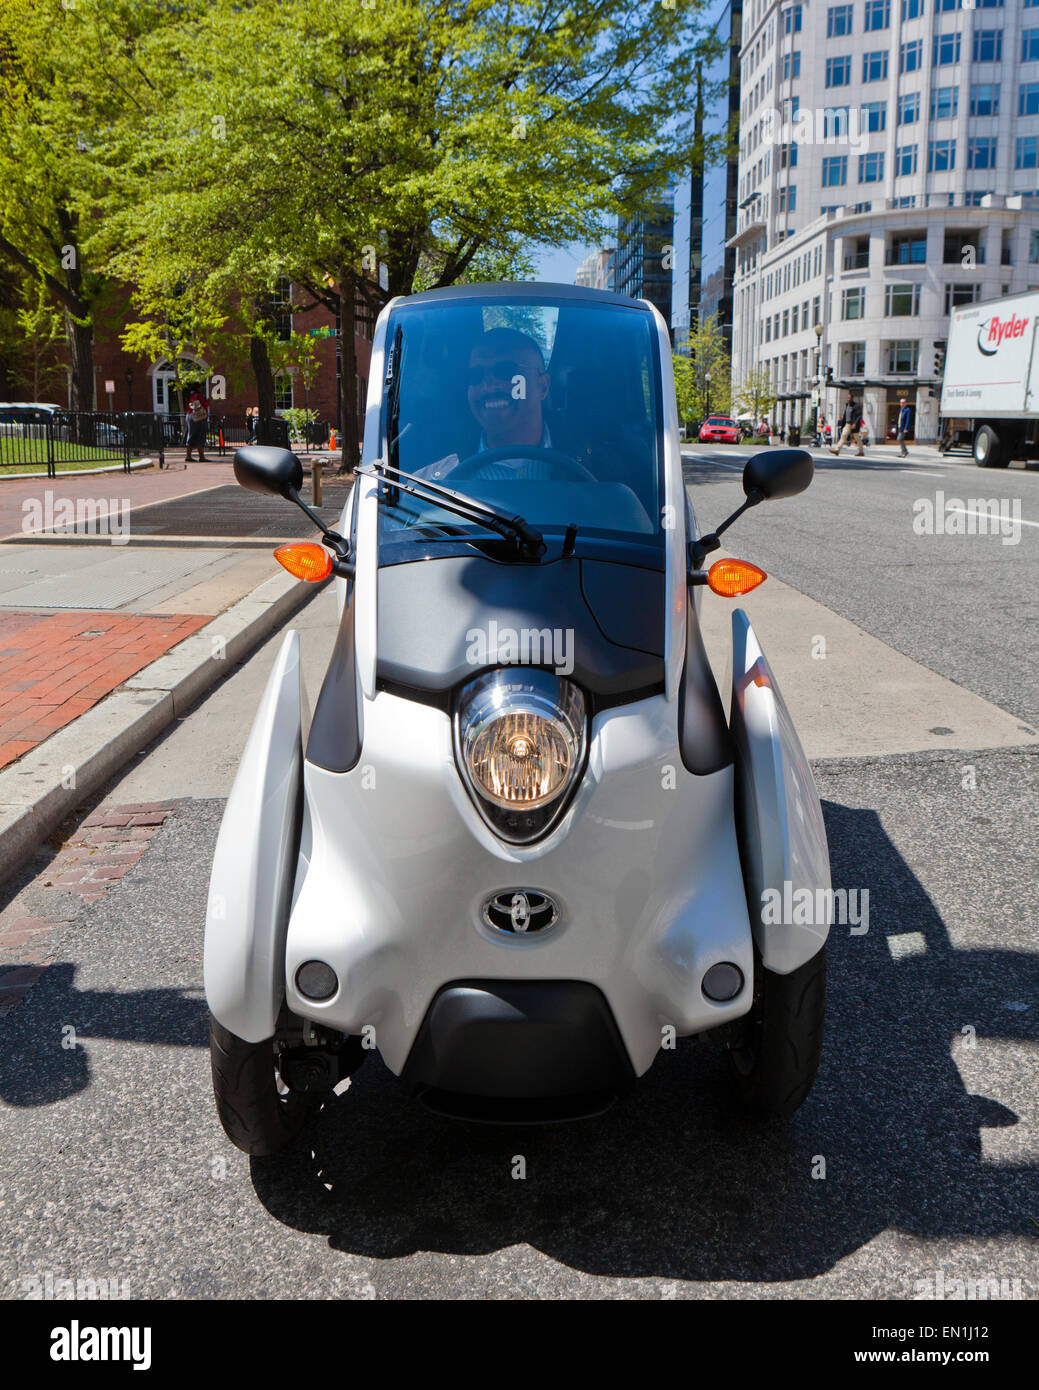 Toyota i-Road concept car (3 wheeled EV) on road - Washington, DC USA - Stock Image